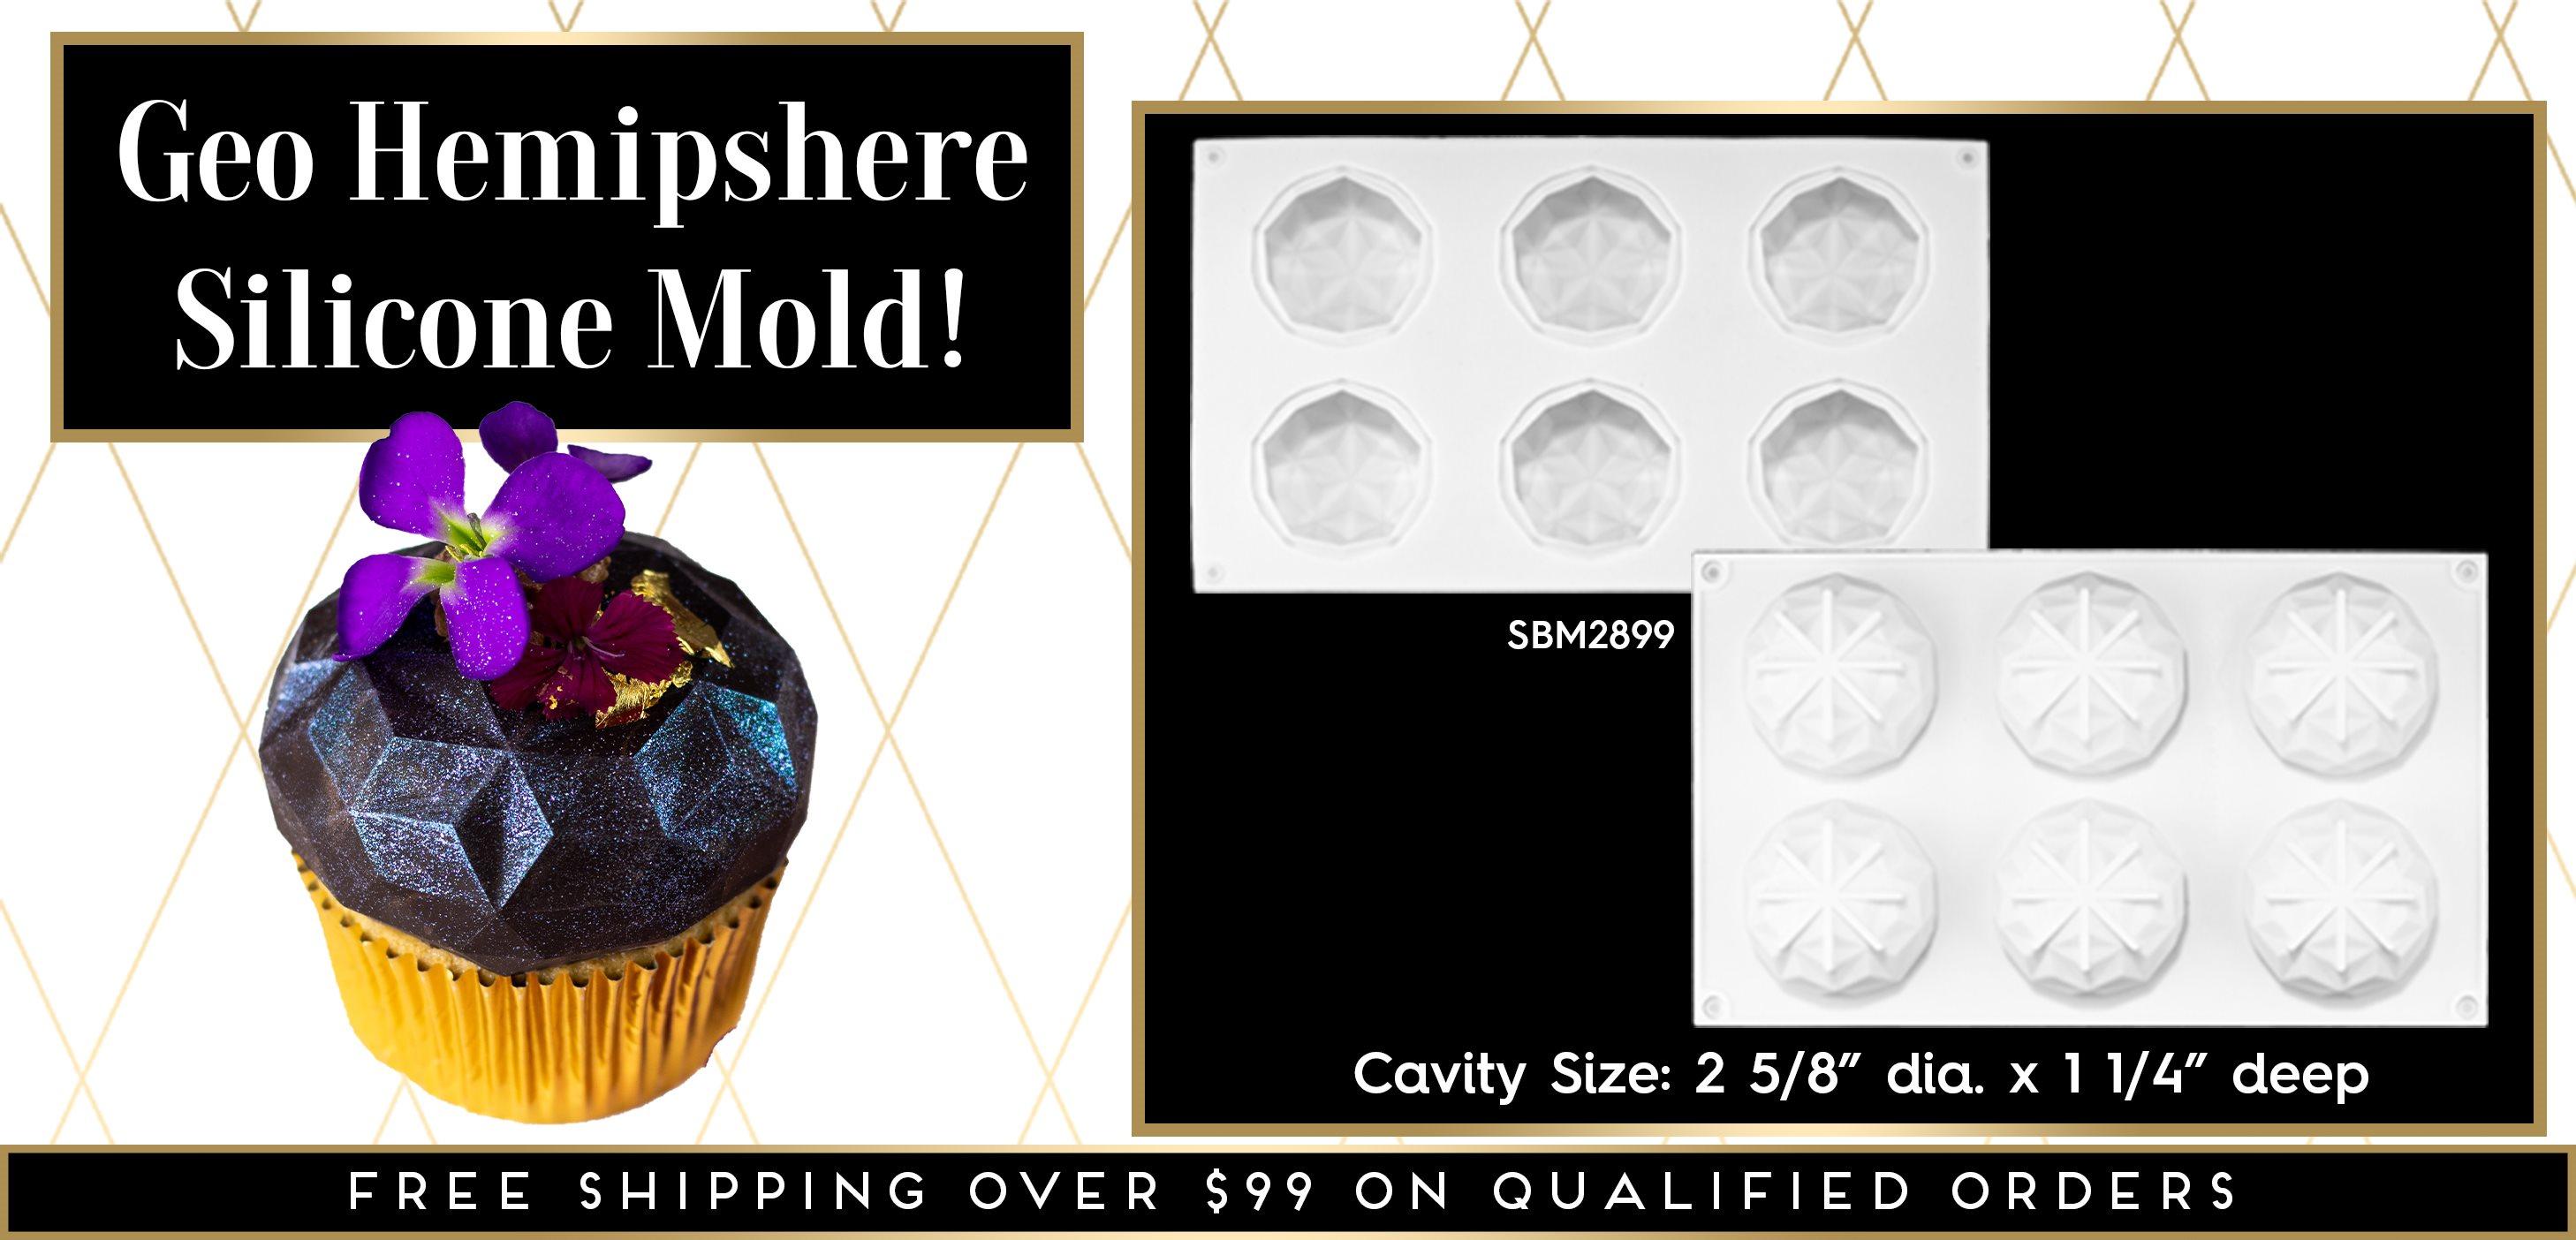 Geo Gem Geometric Hemisphere Half-Sphere Dome Silicone Mold